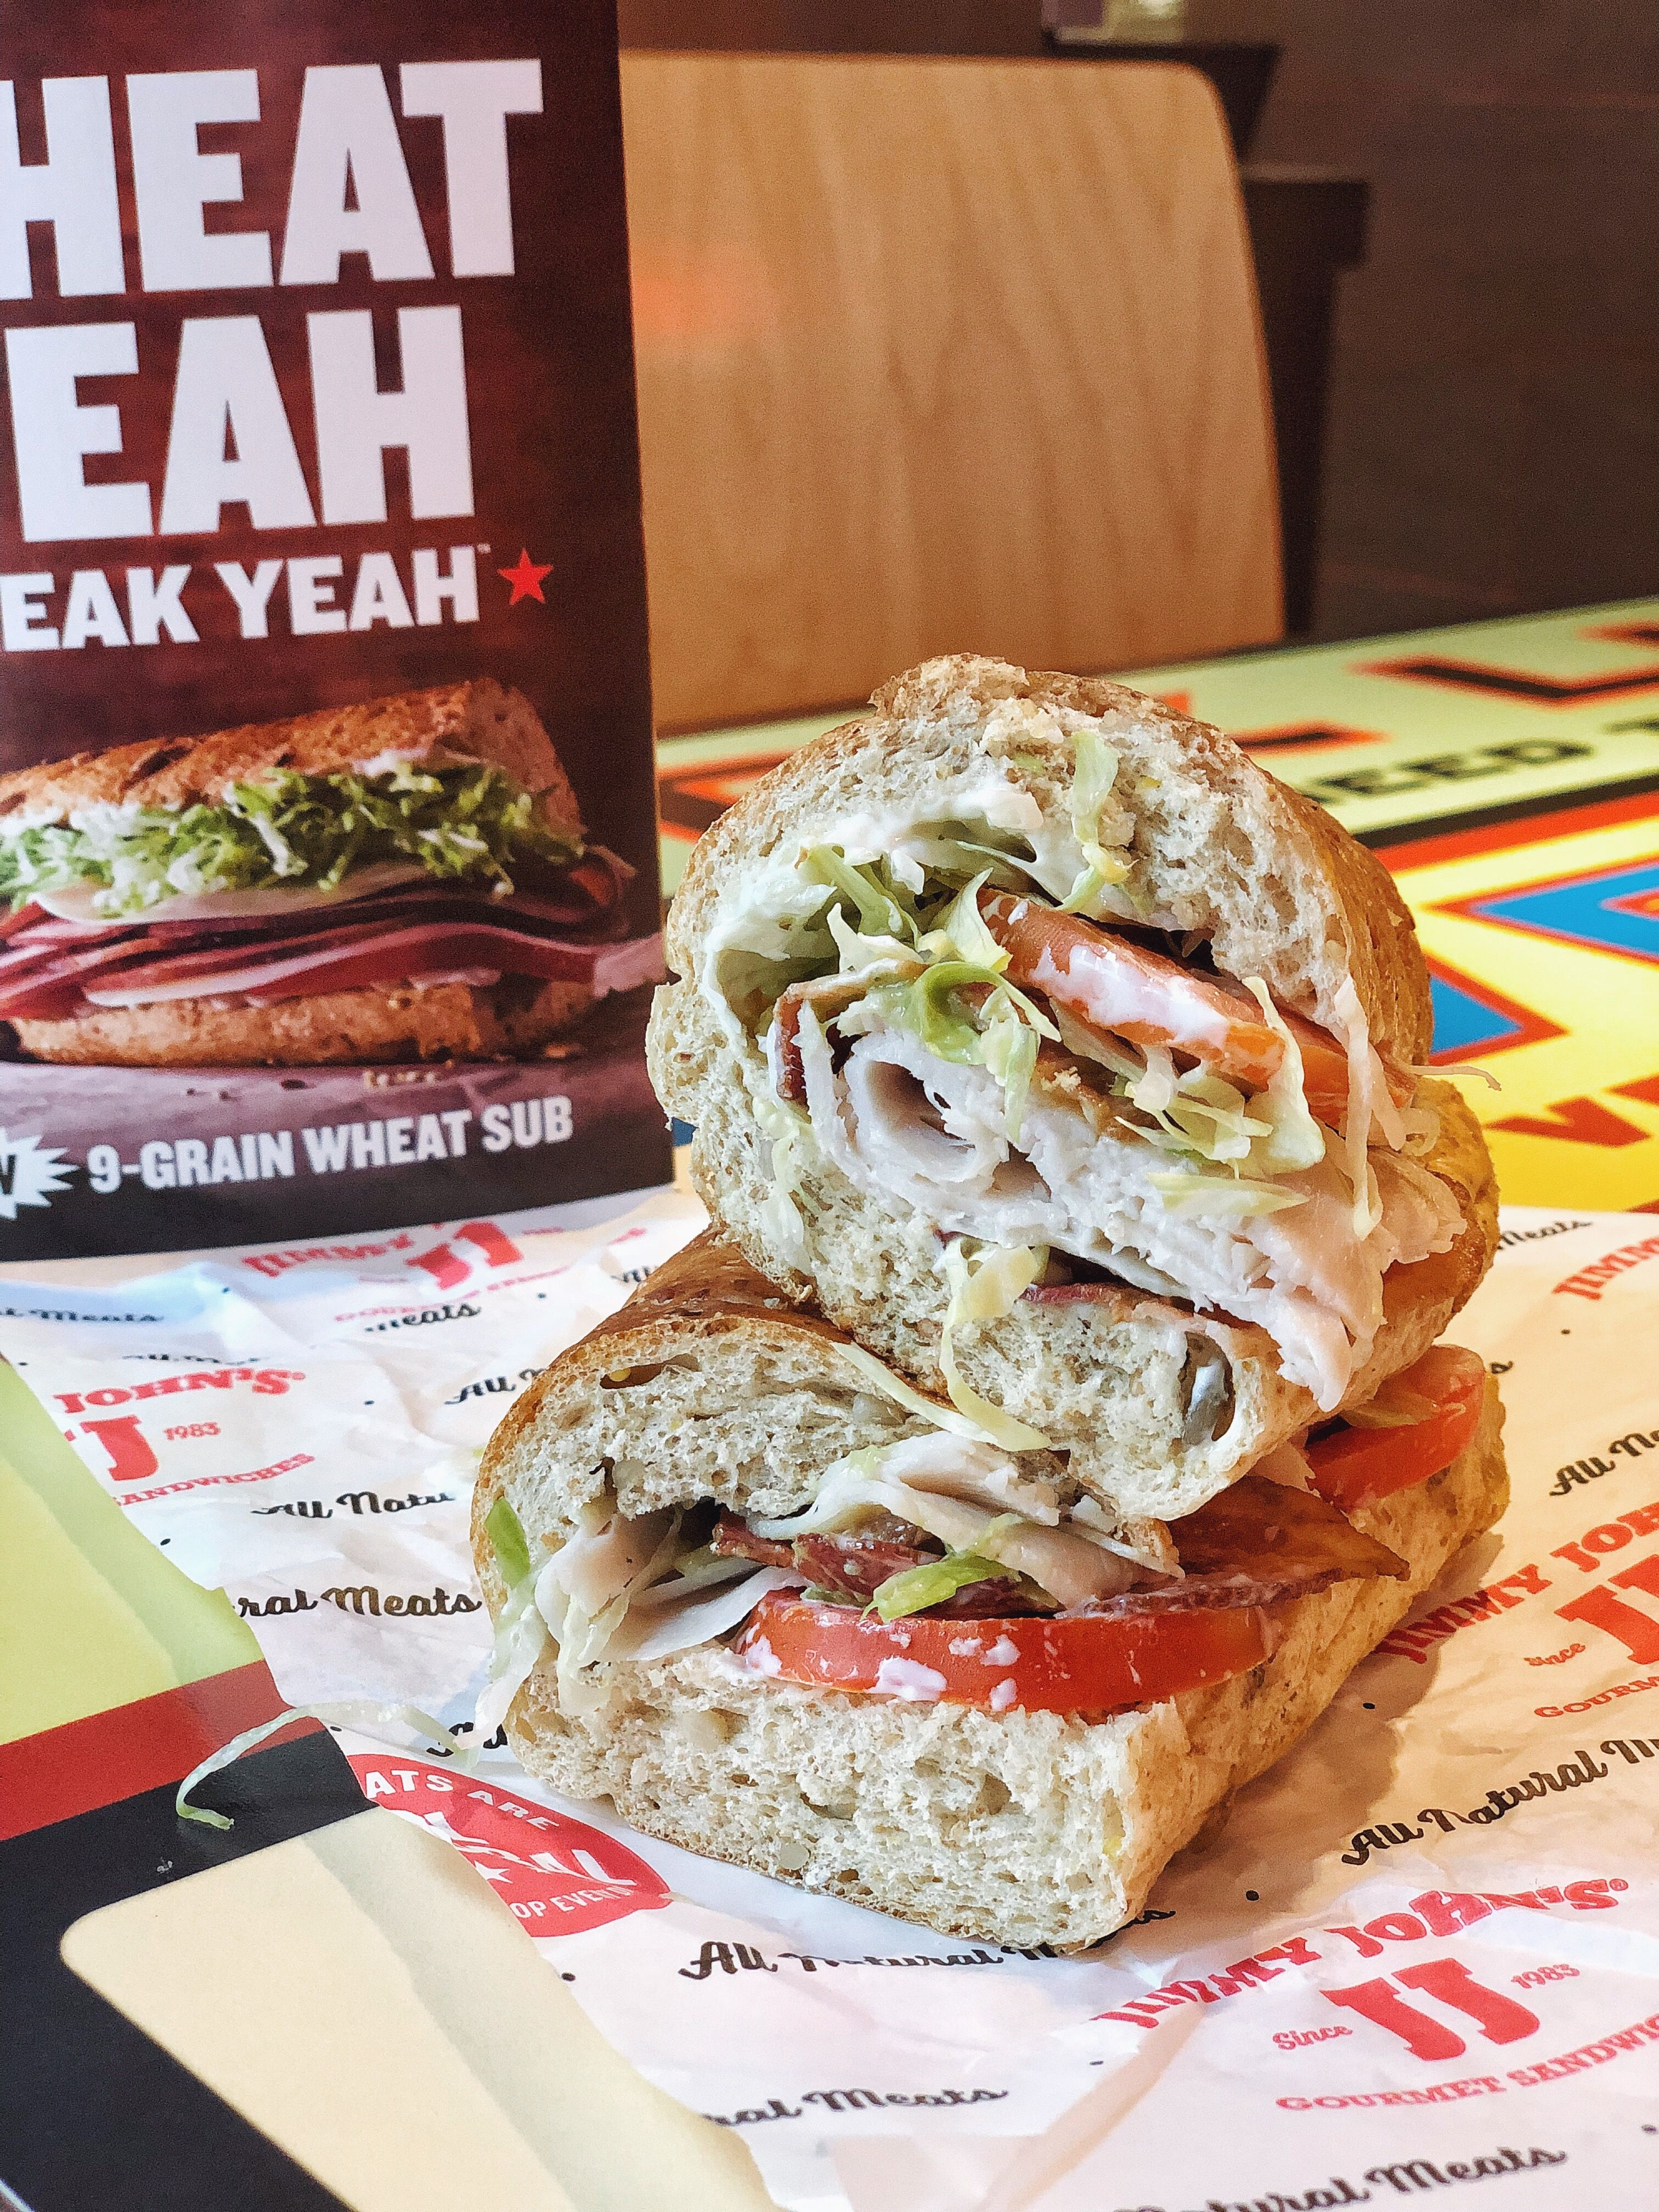 Wheat Yeah, Freak Yeah™! Jimmy John's is taking their